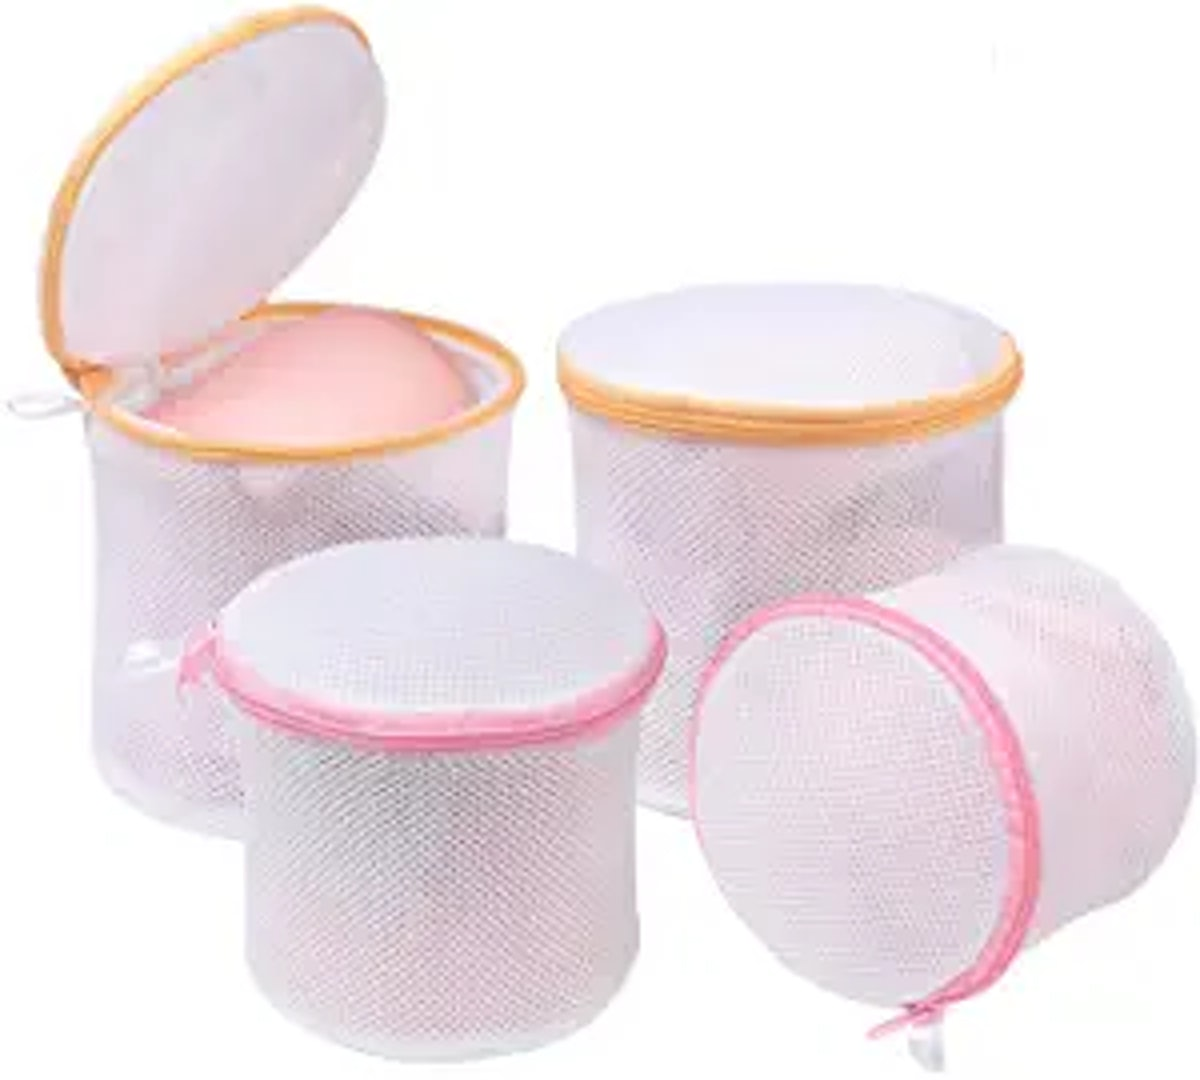 BAGAIL Laundry Bag Mesh Wash Bag (4-Piece Set)